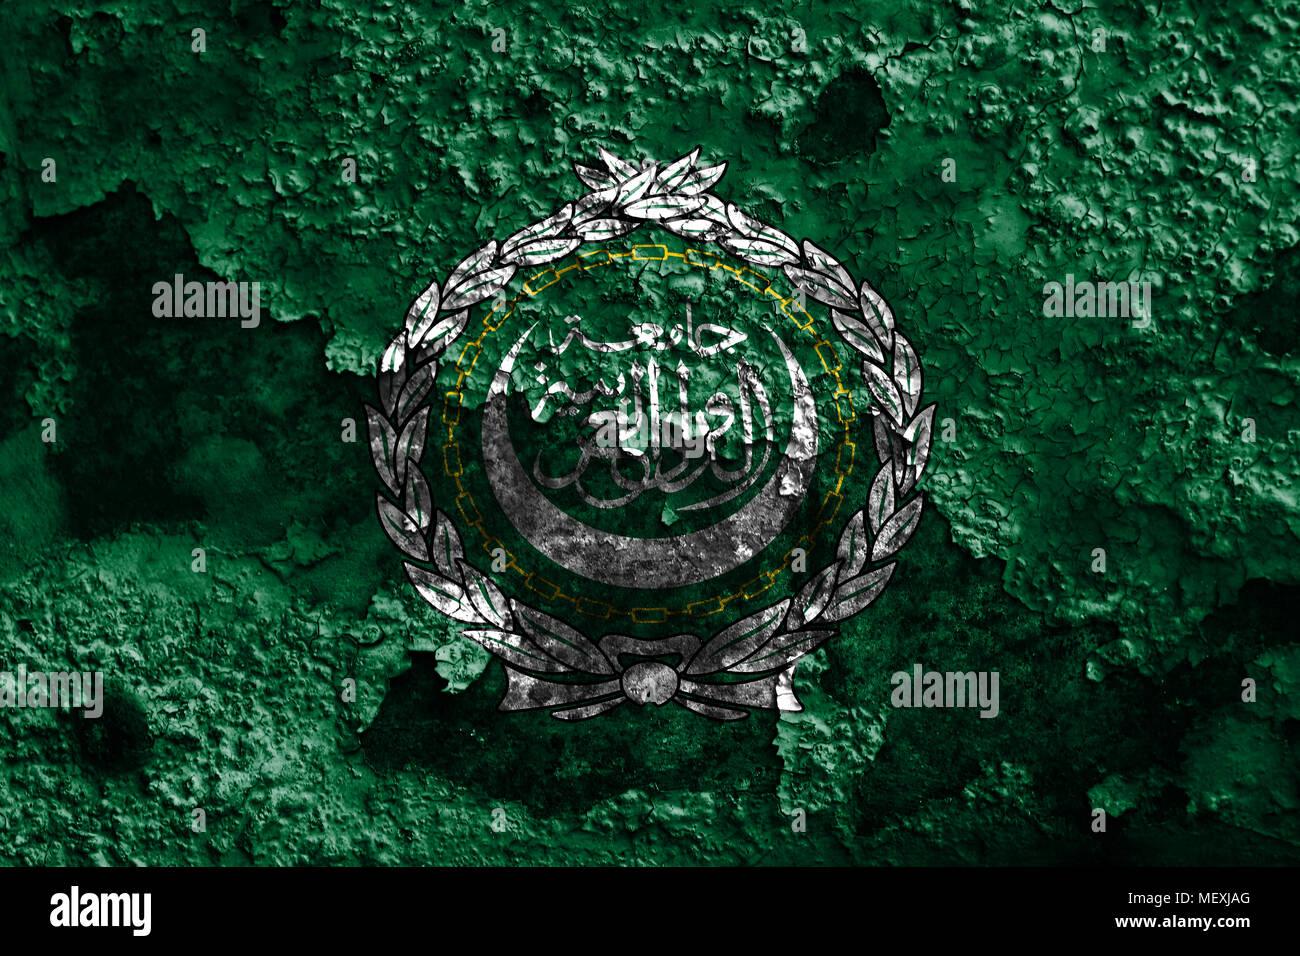 Arab League grunge flag, regional organization of Arab states - Stock Image